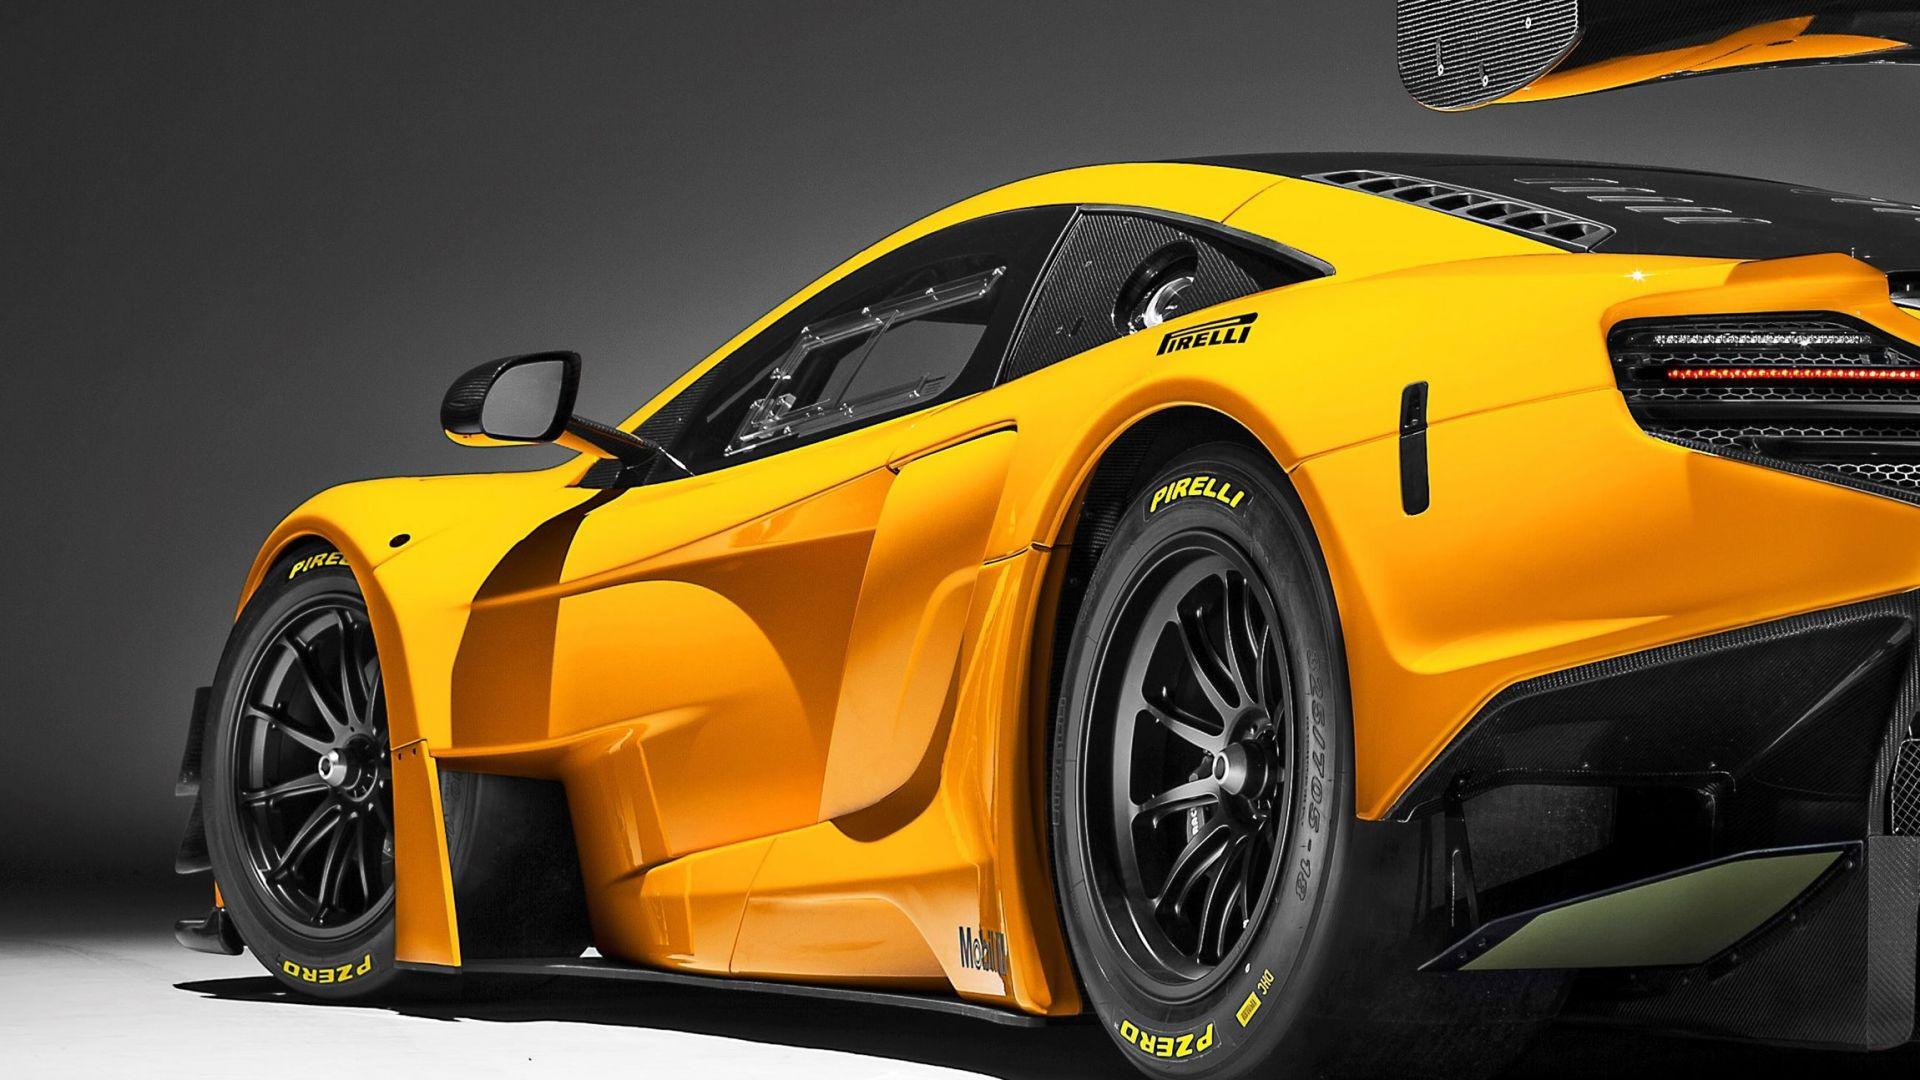 Desktop Wallpaper Mclaren 650 S Gt3 Yellow Sports Car Side